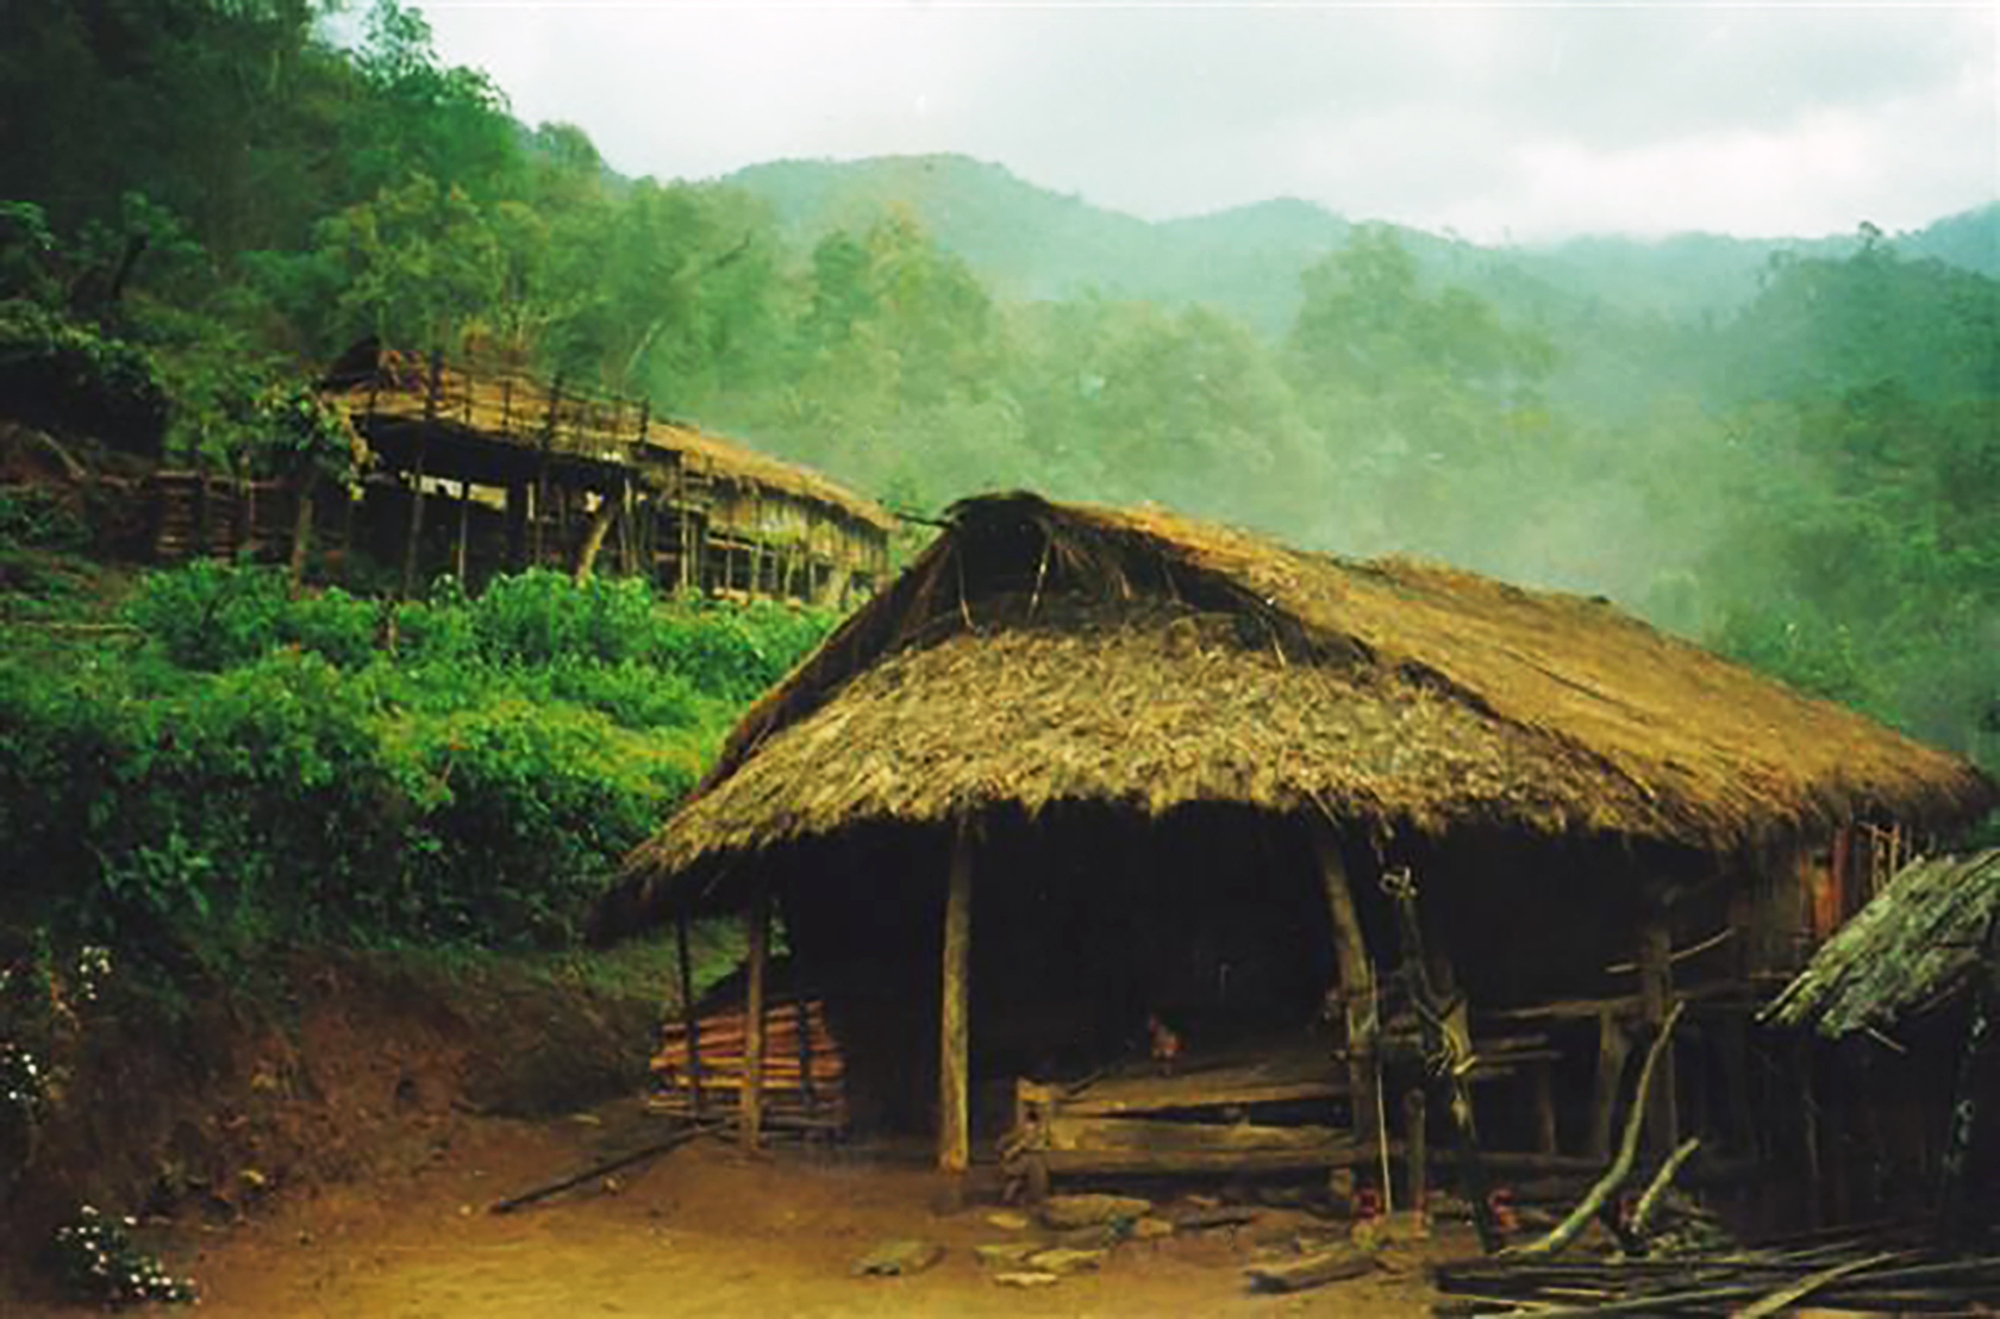 Lamboi's family home in Mongken village.